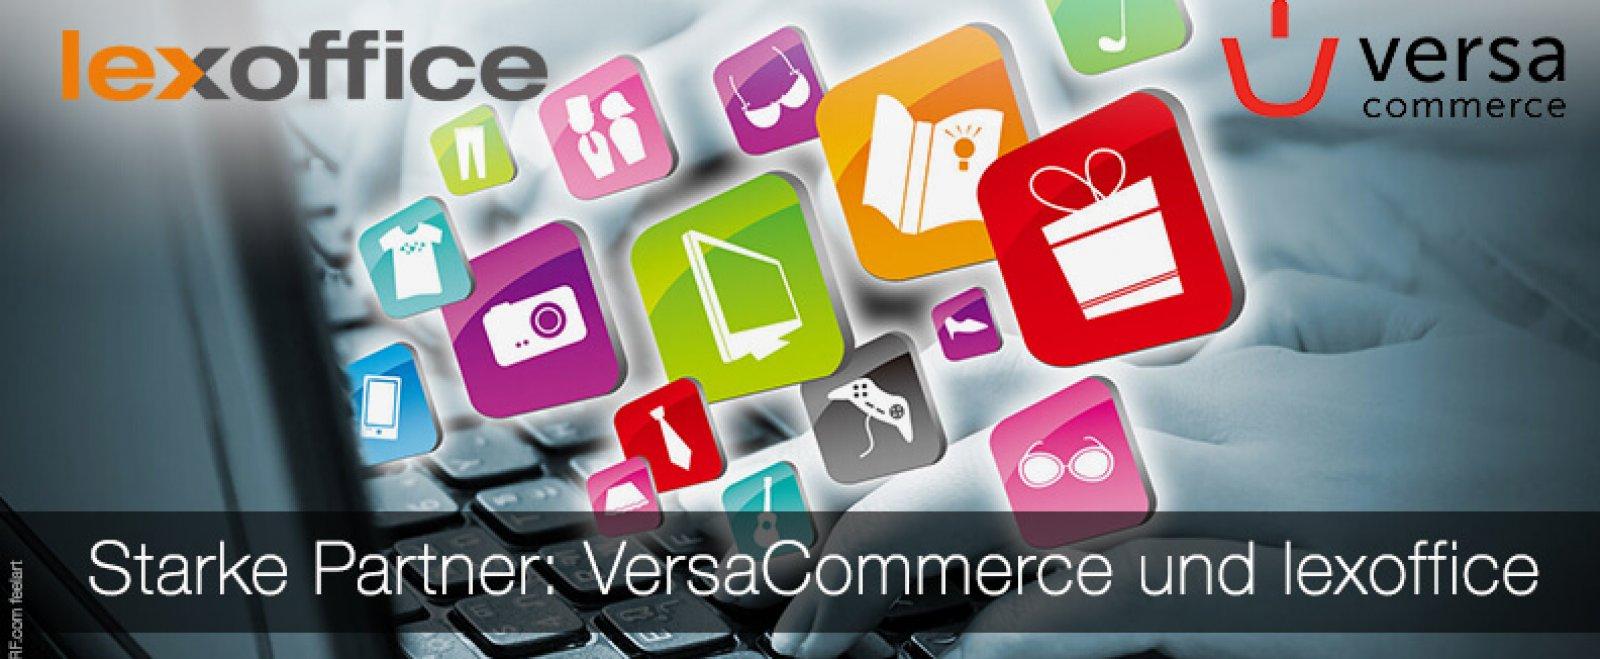 Tolle Neuigkeiten: E-Commerce Lösung VersaCommerce mit lexoffice